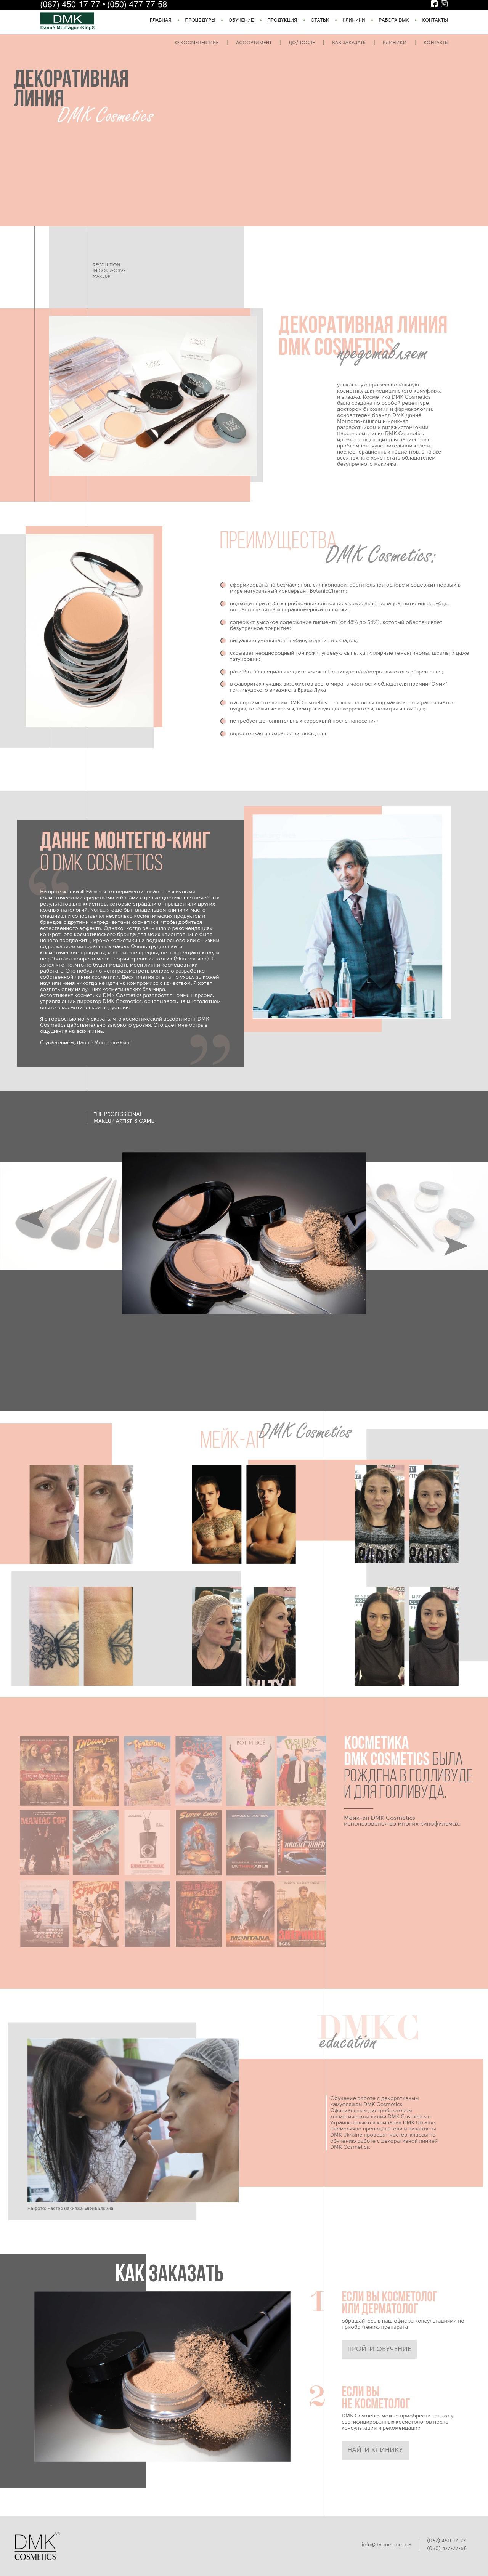 Фото Разработка сайта под ключ. 9 рабочих дней